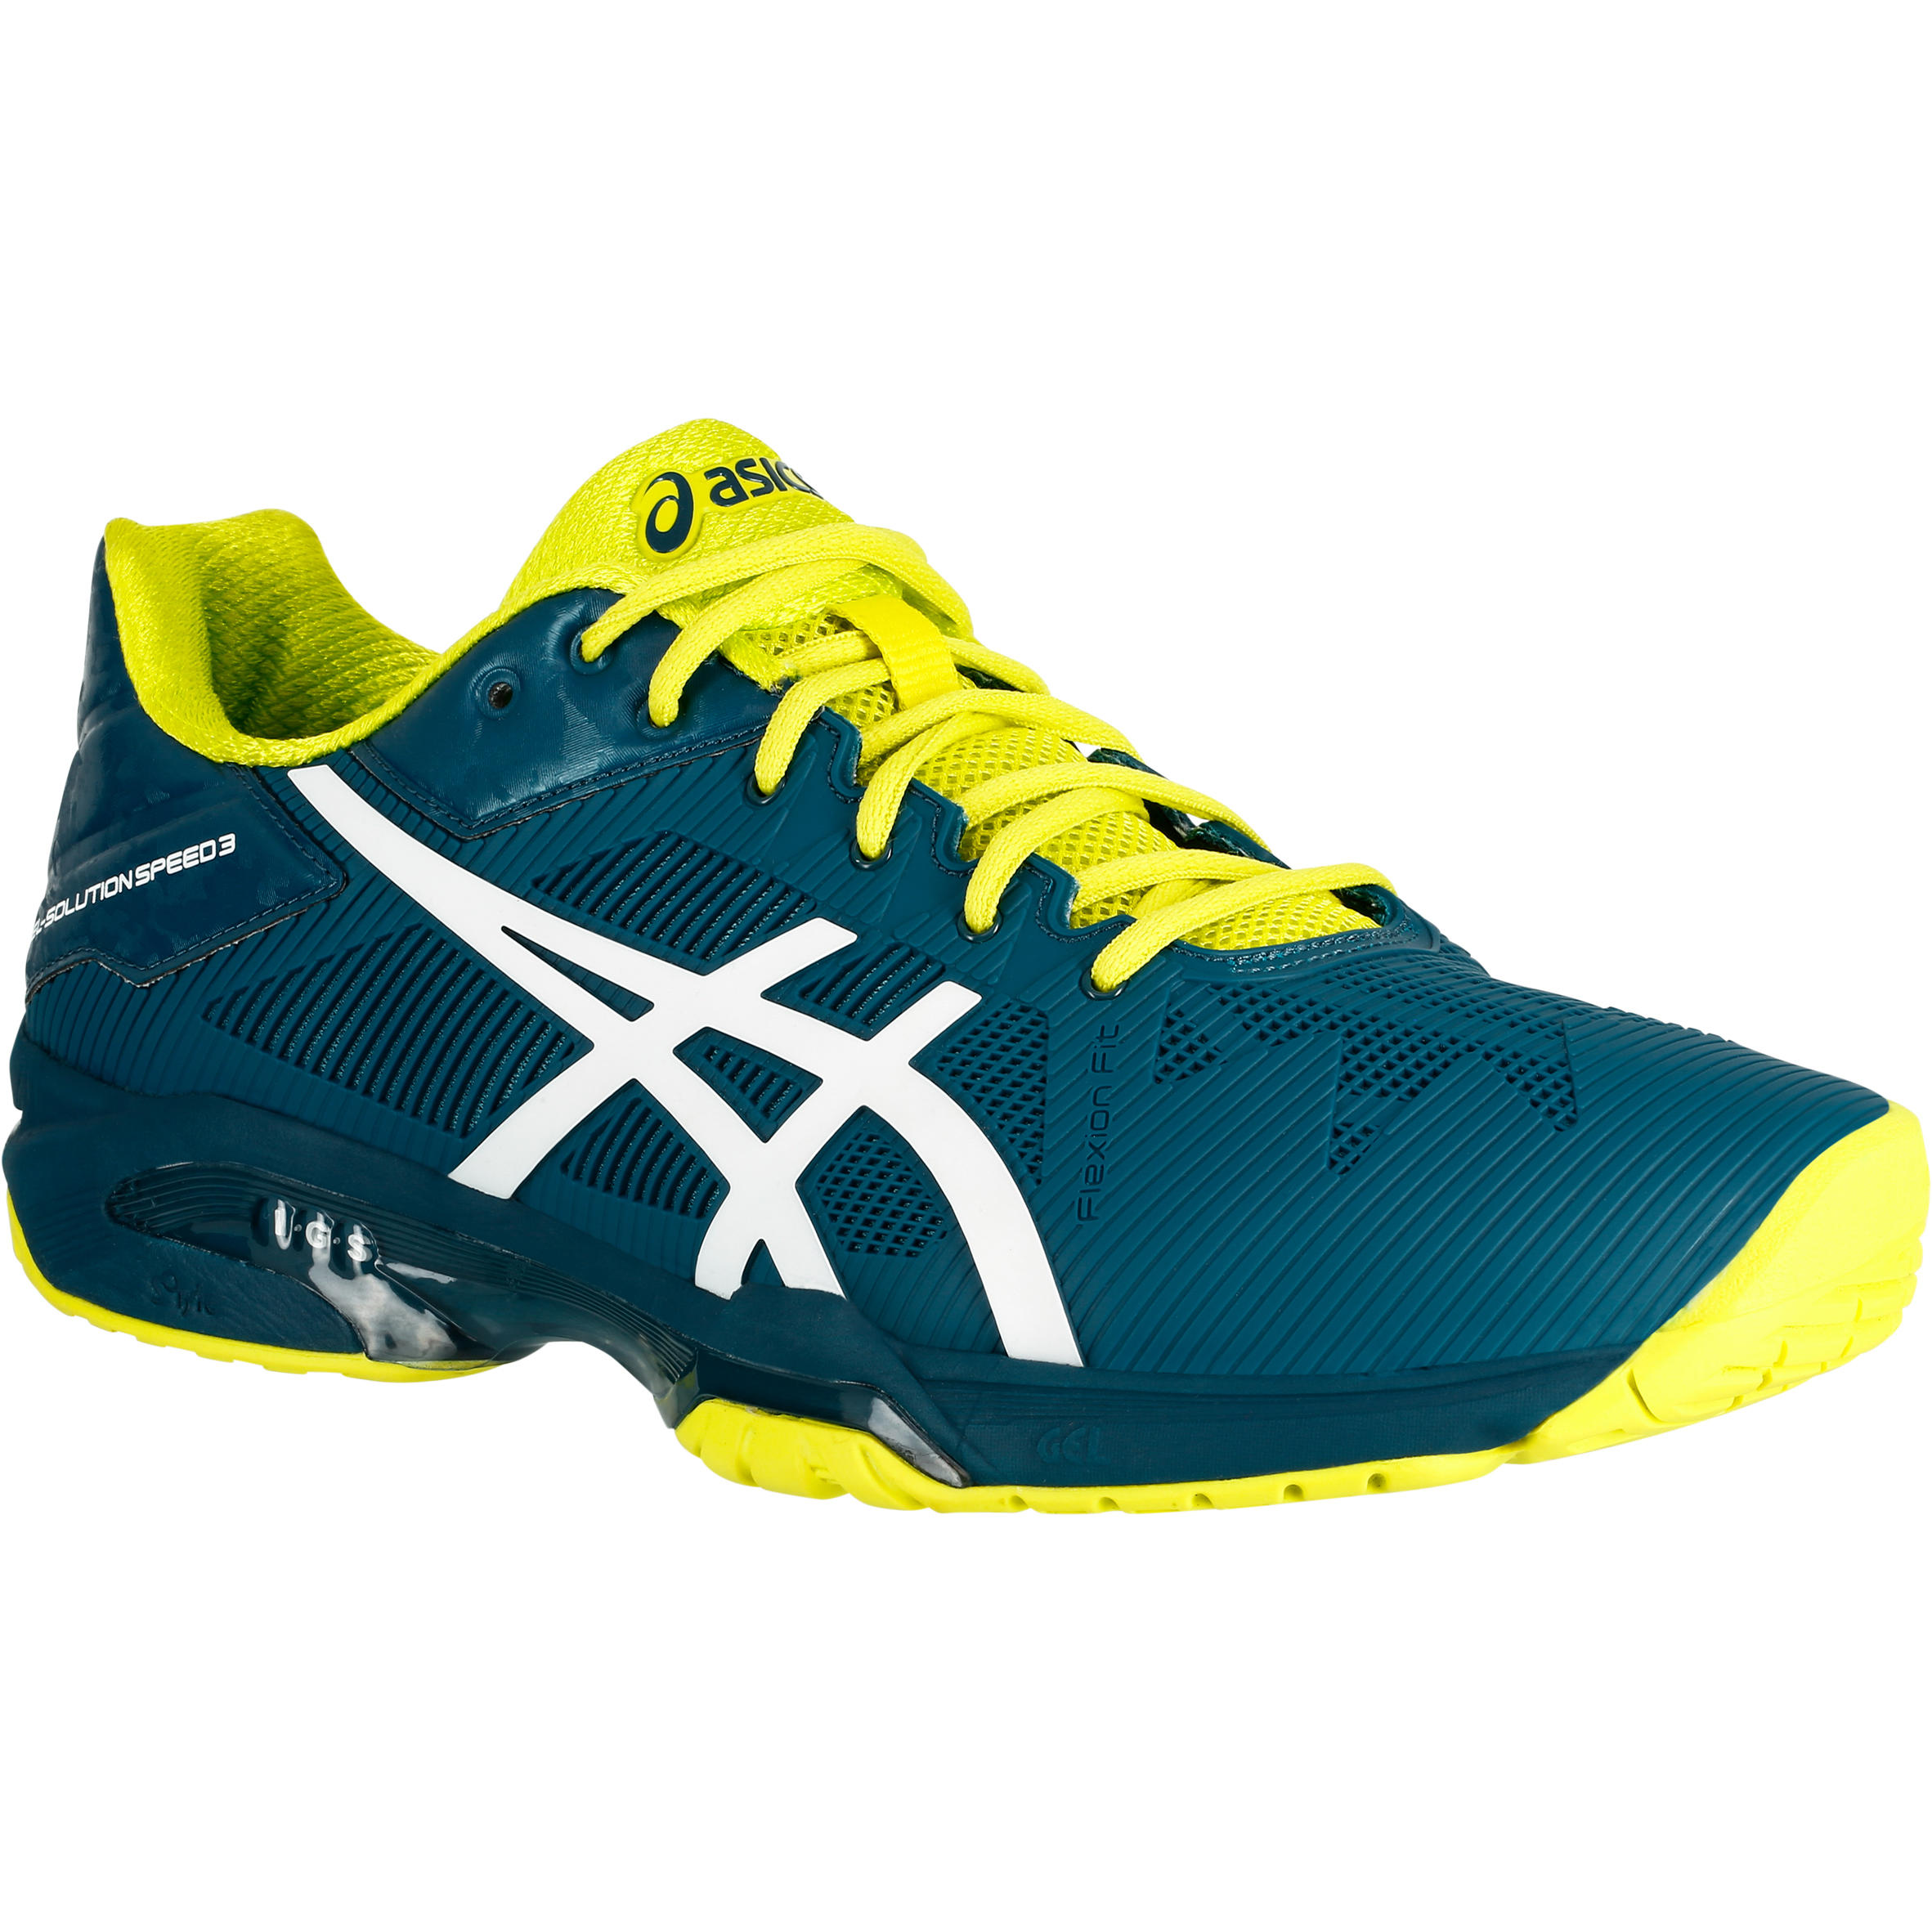 Asics Tennisschoenen heren Gel-Solution Speed 3 blauw